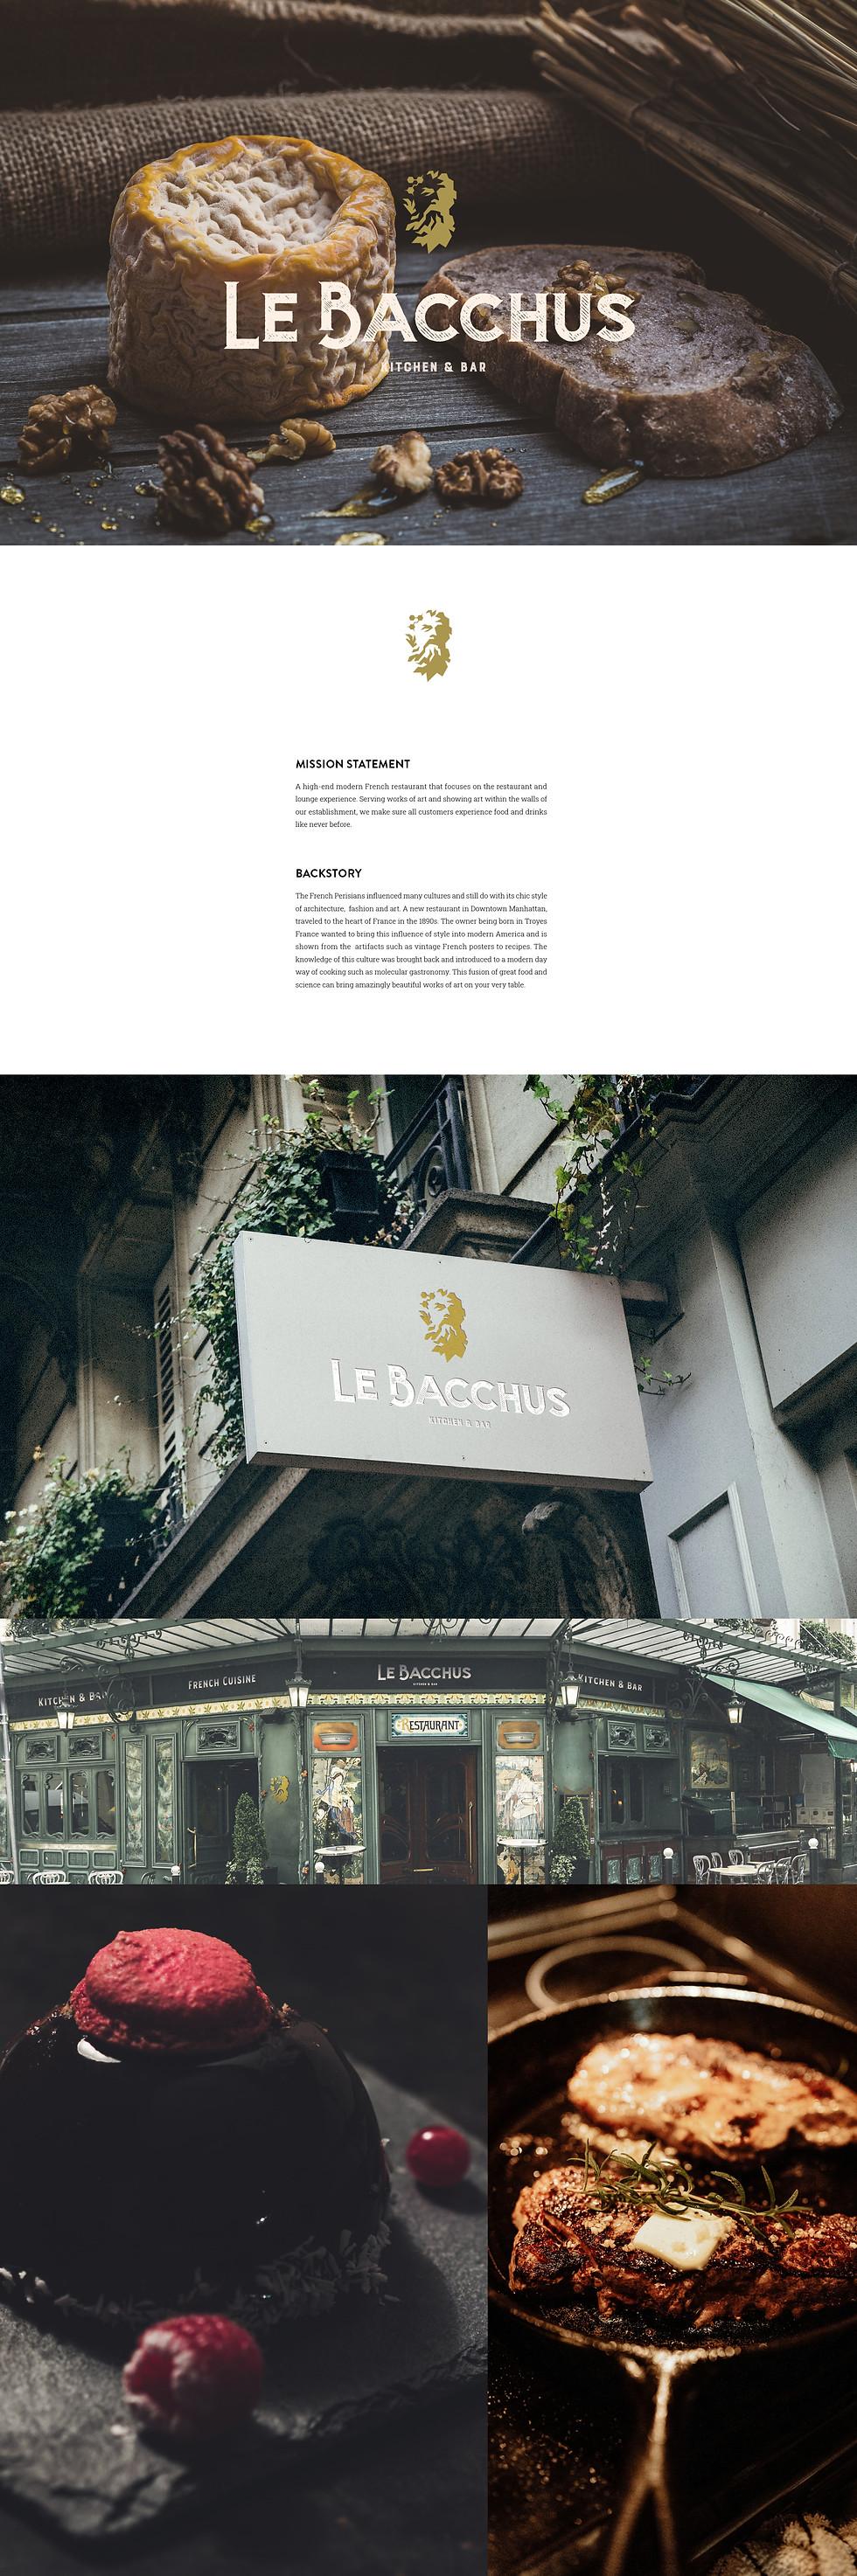 LeBacchus_BehanceLayout_A.jpg